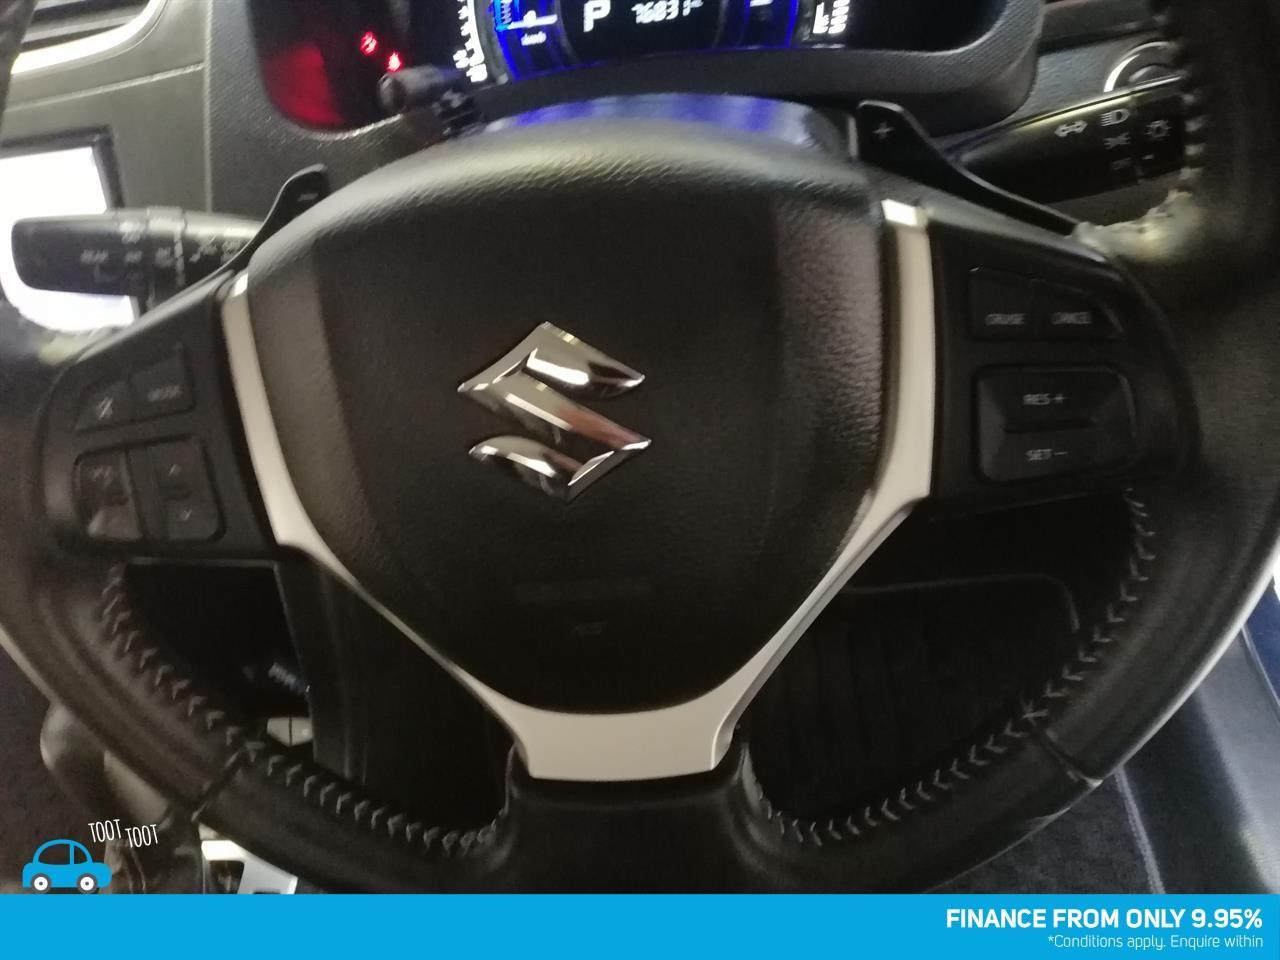 image-14, 2015 Suzuki SWIFT DJE Style Edition at Dunedin